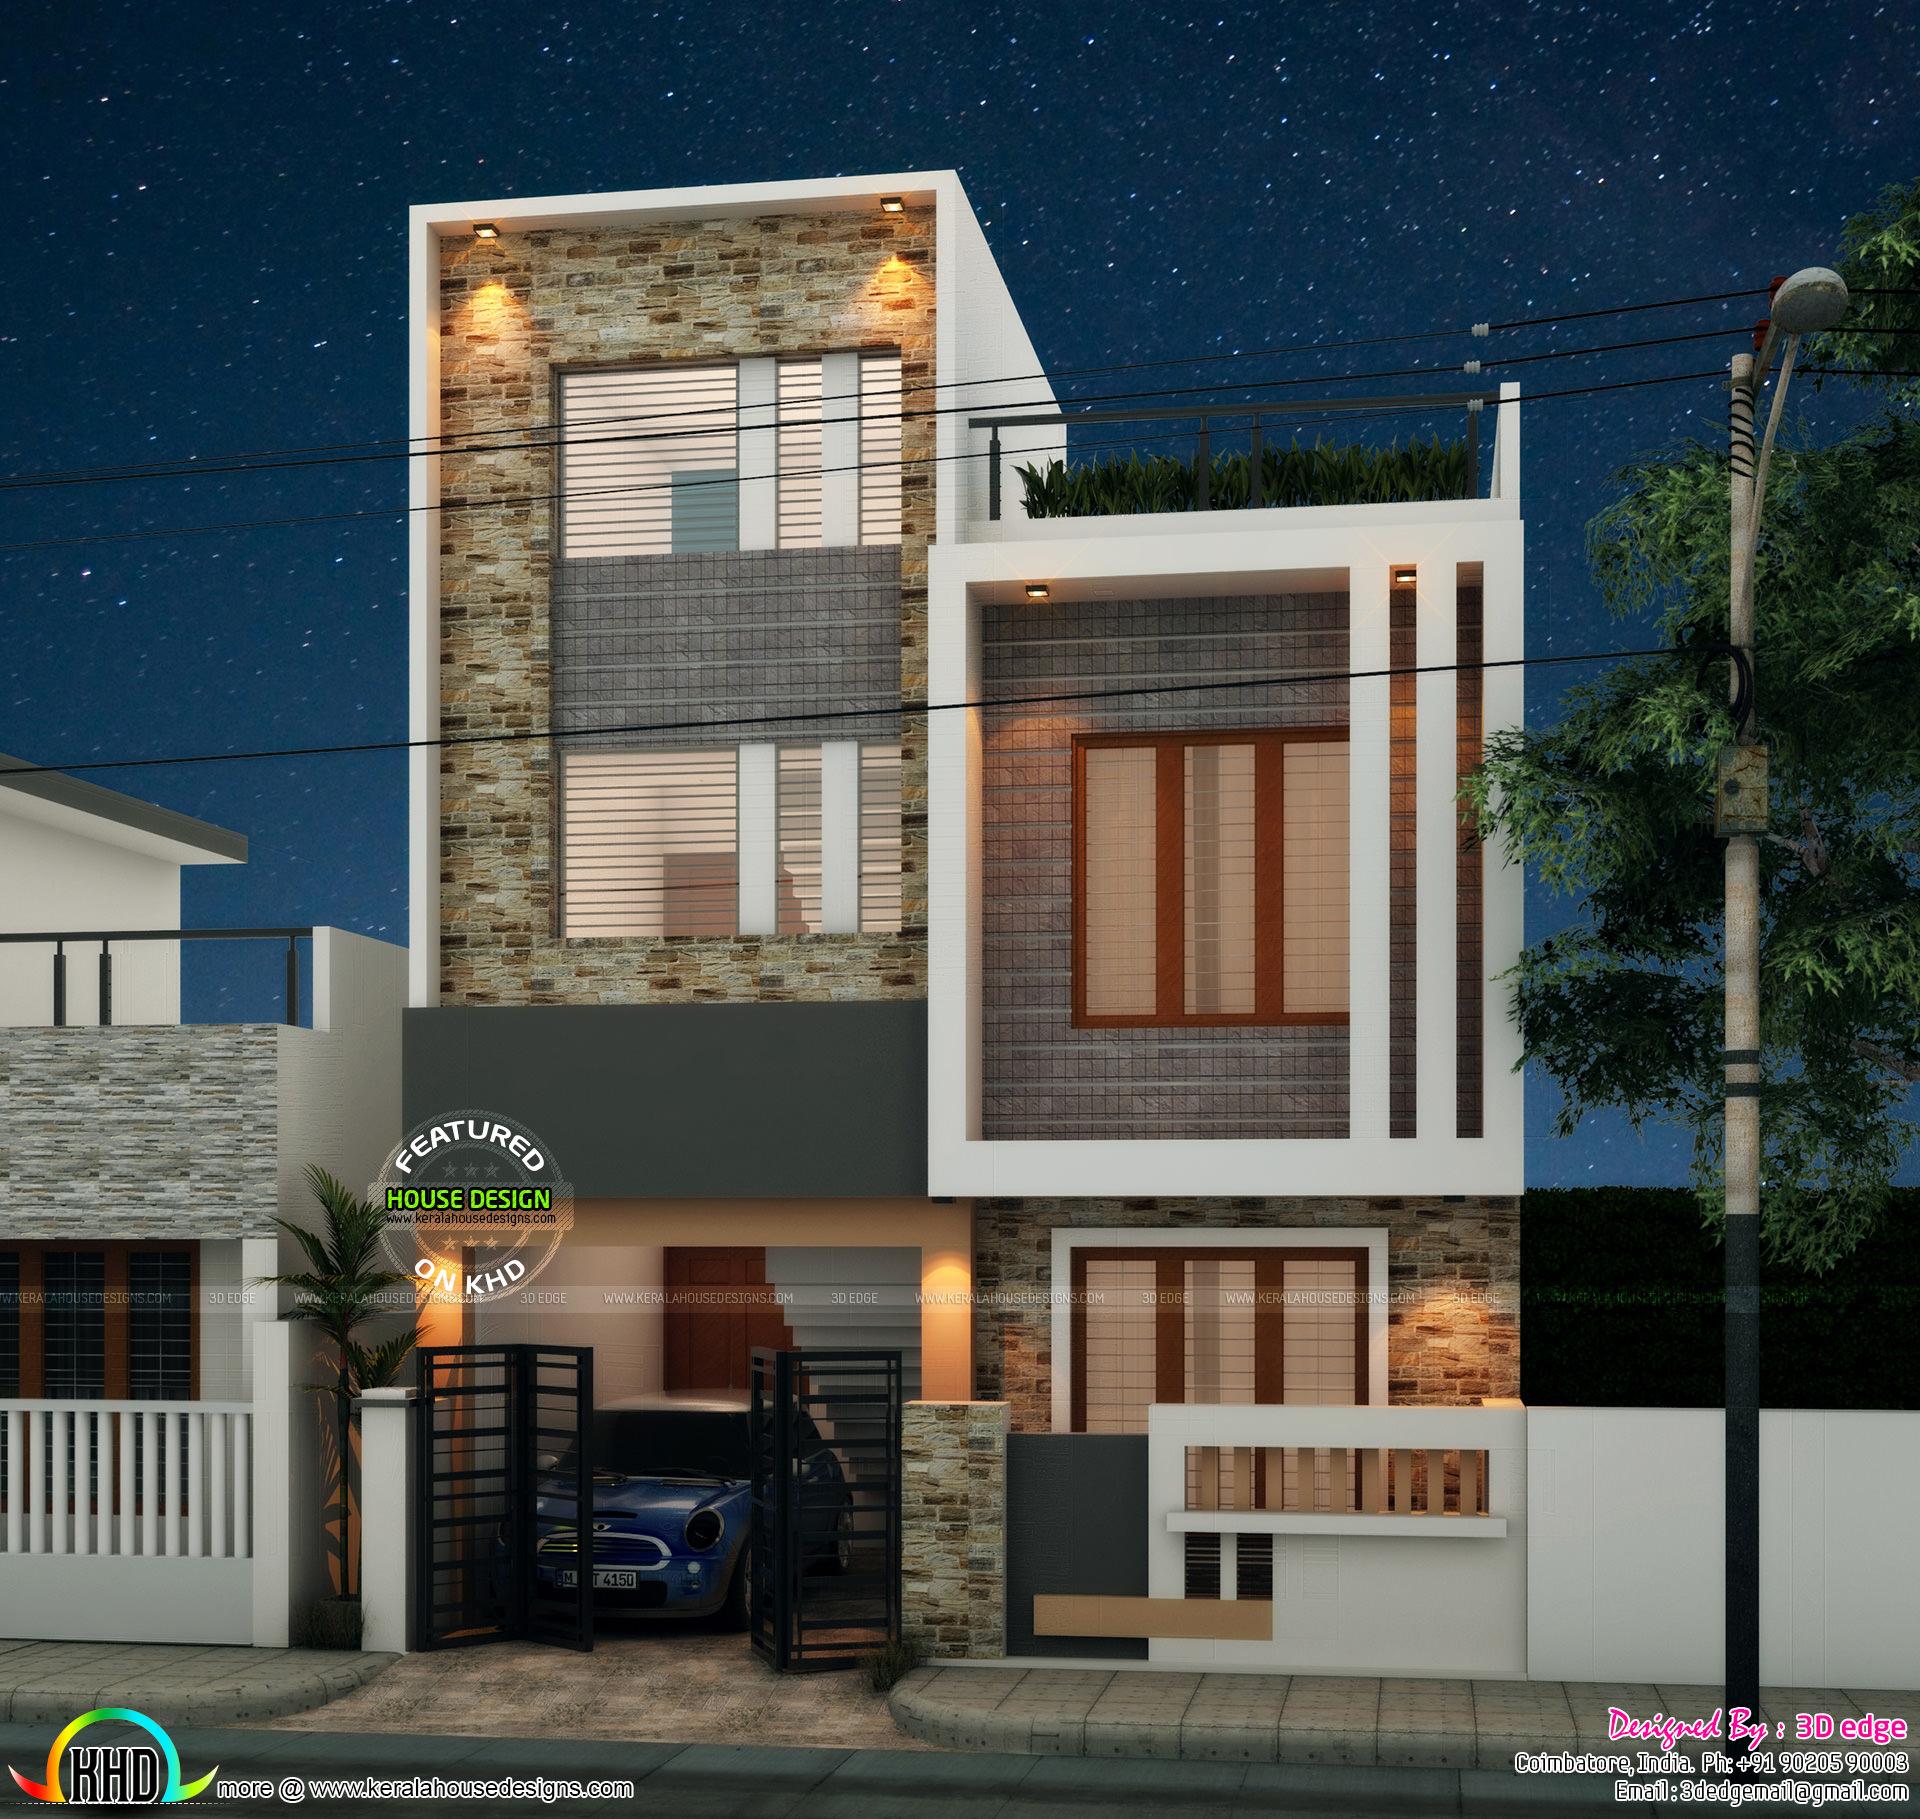 1800 sqft 4 bedroom modern box type home  Kerala home design  Bloglovin